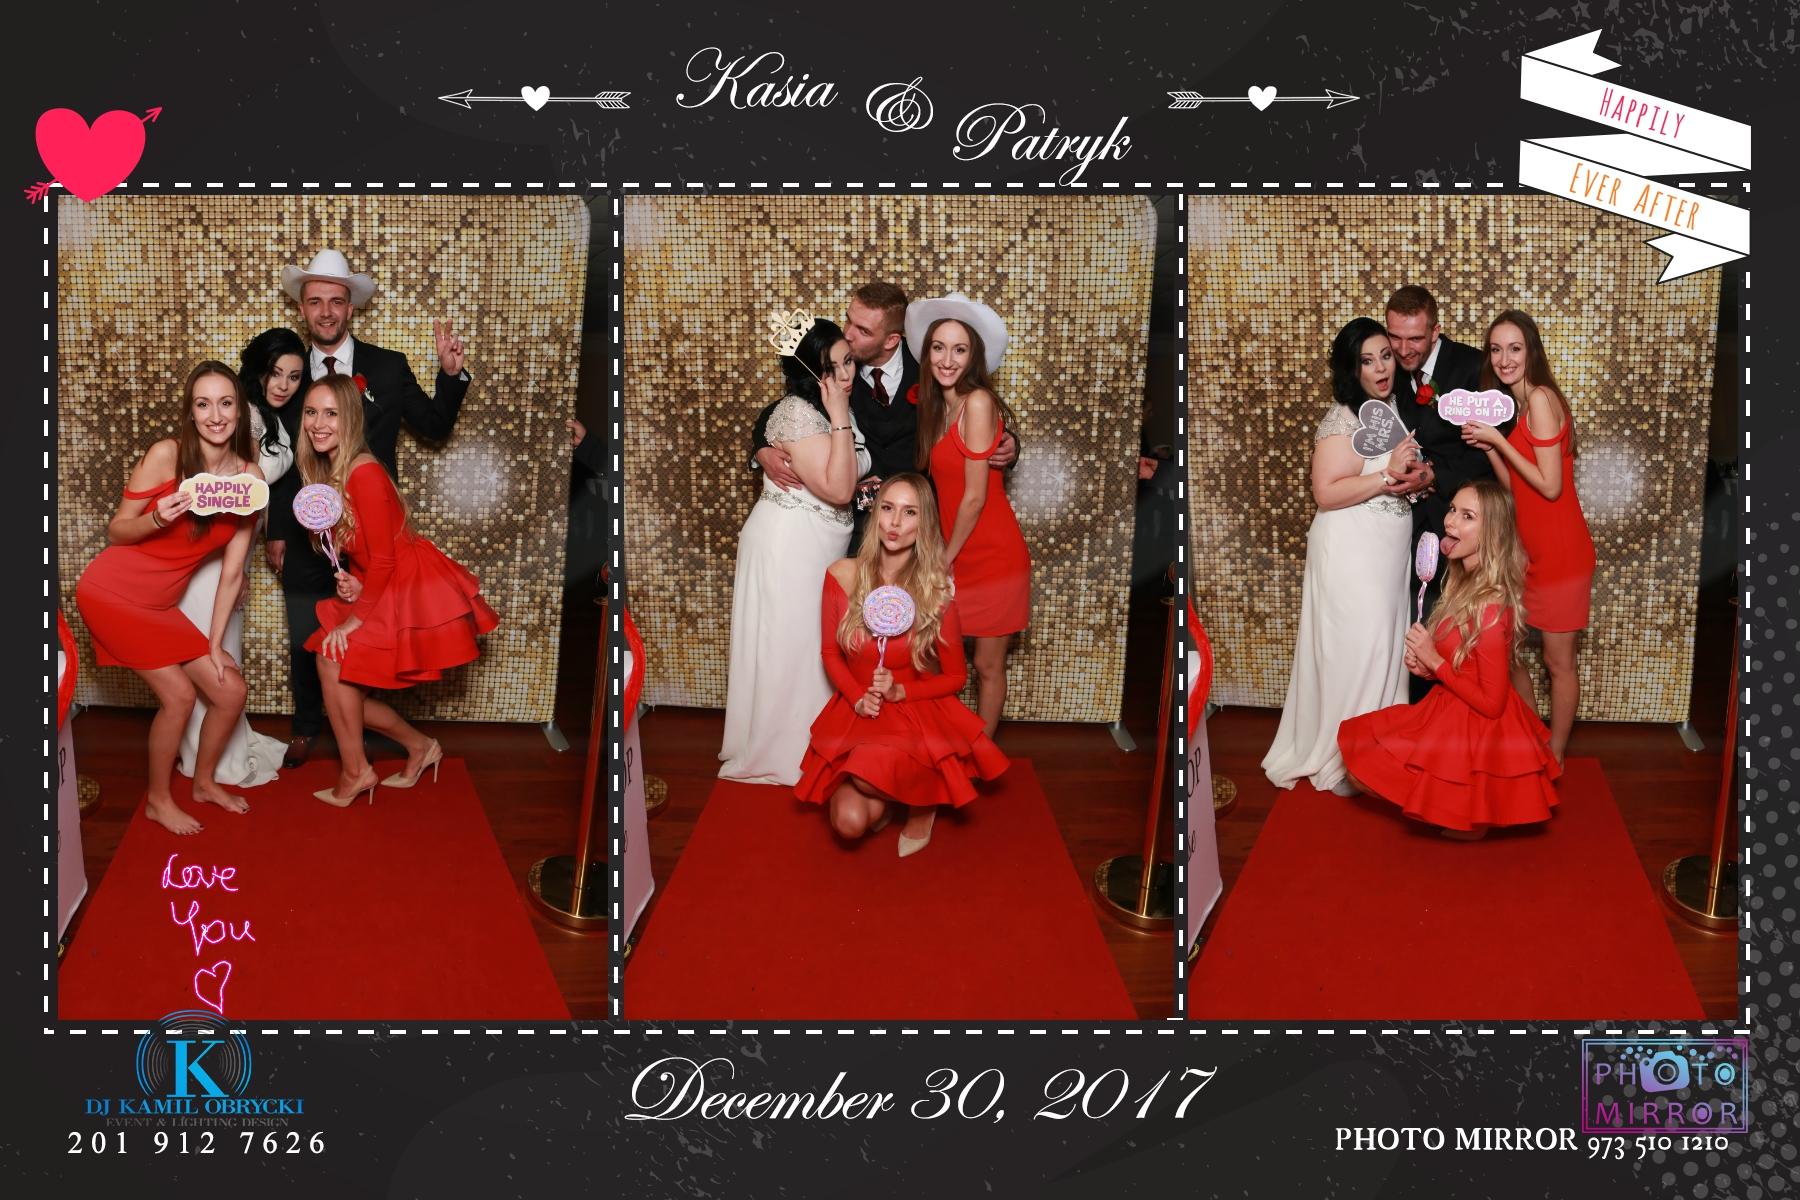 photobooth photo